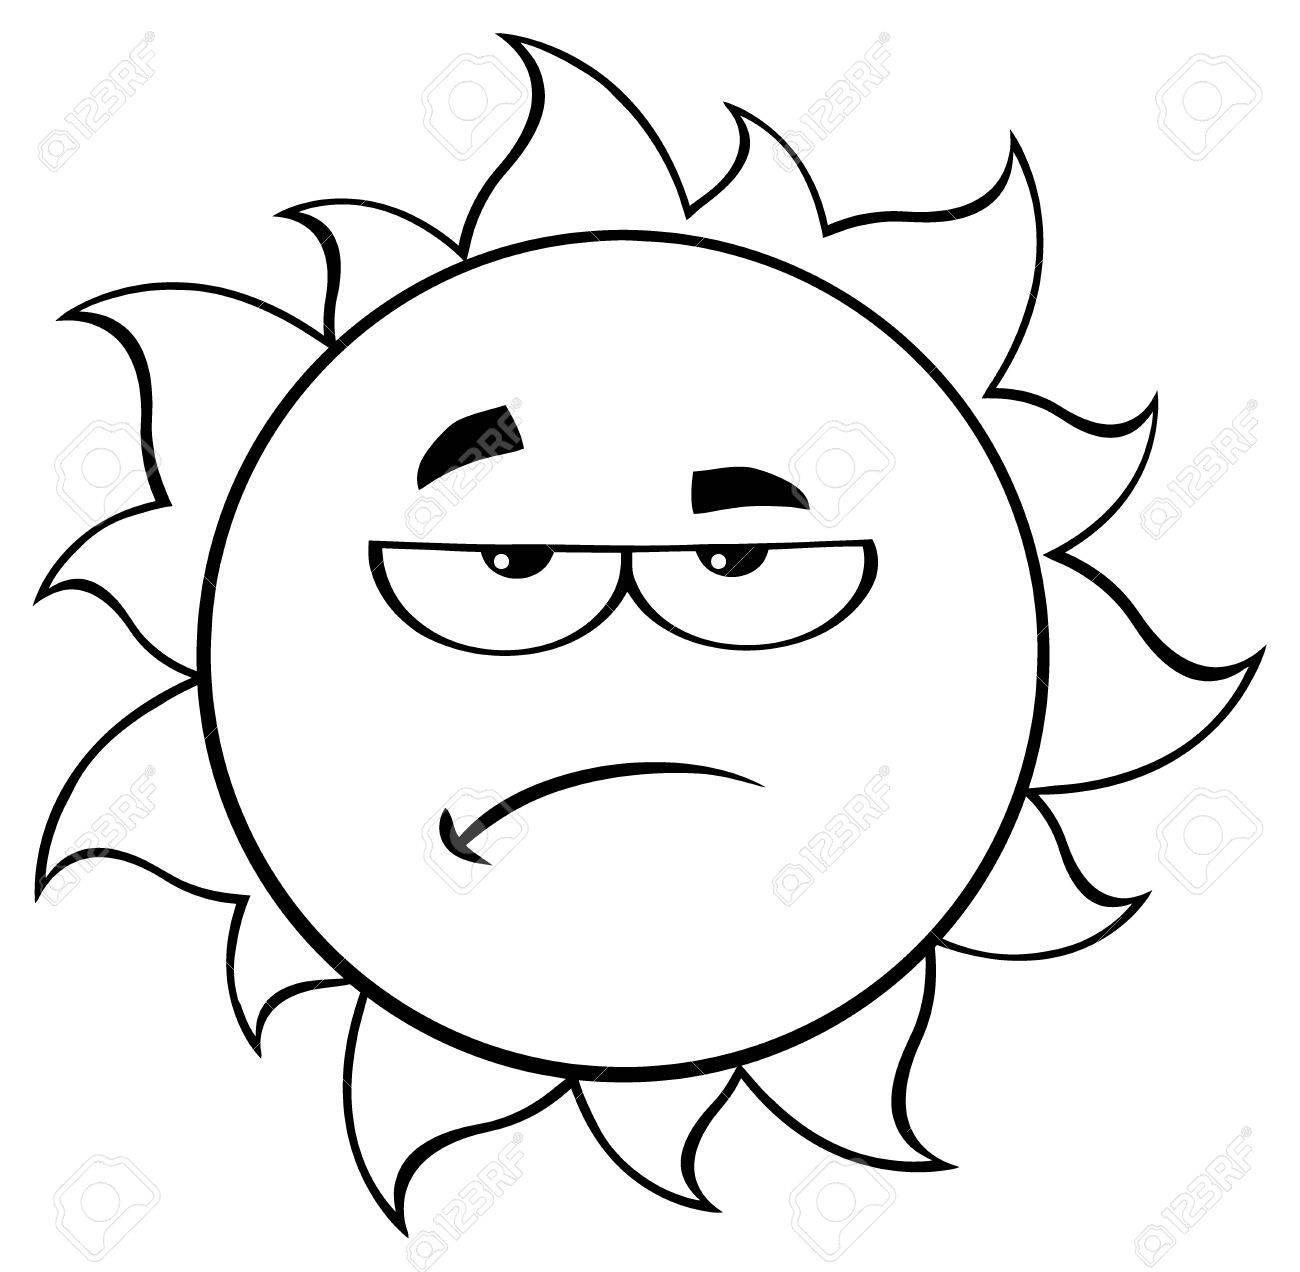 1300x1272 Black And White Grumpy Sun Cartoon Mascot Character. Illustration